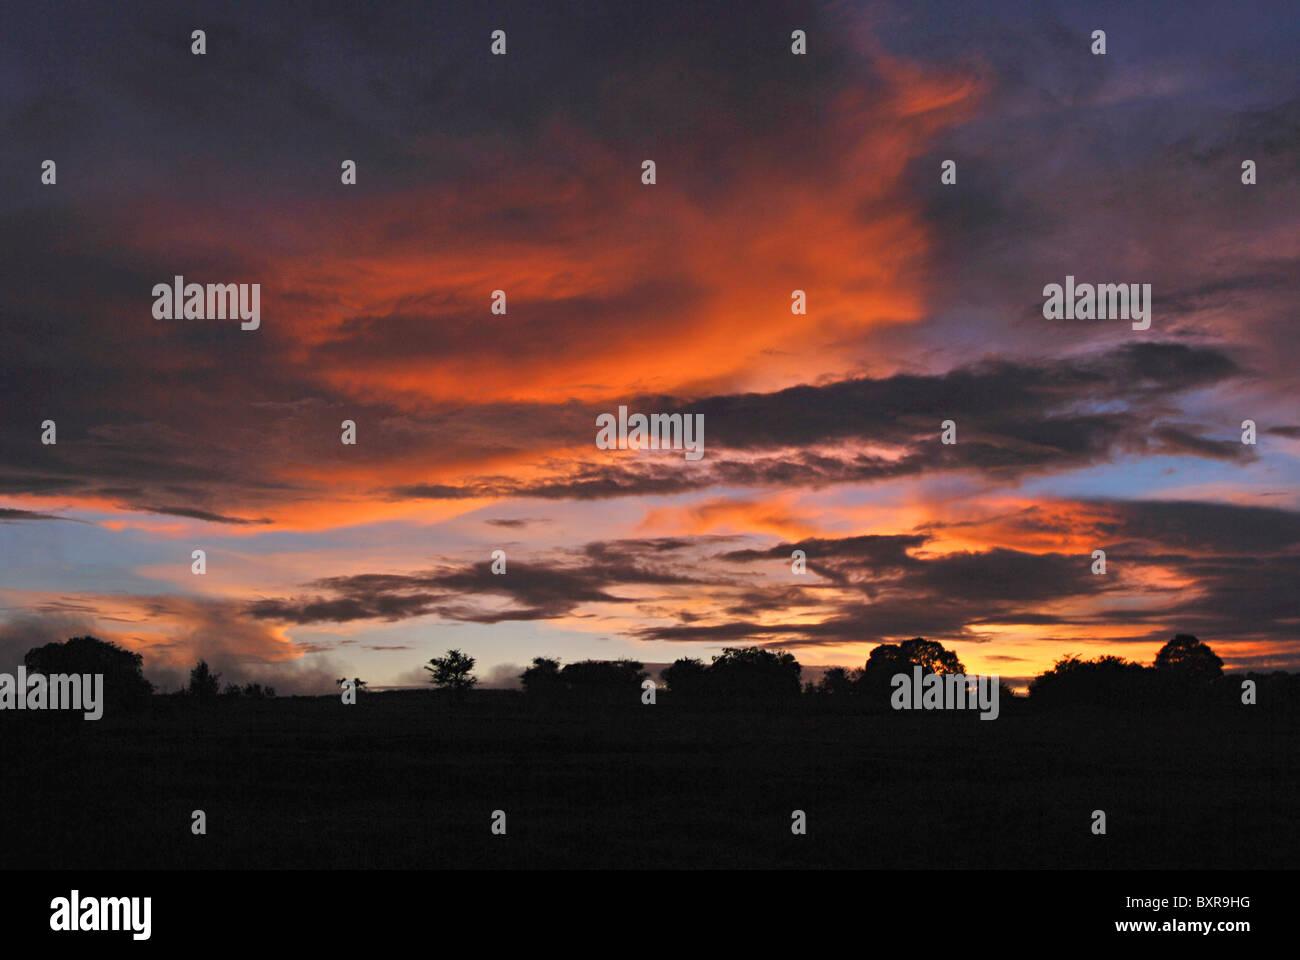 Evening sky at kaas. Location: Kaas plateau (Satara) - Stock Image